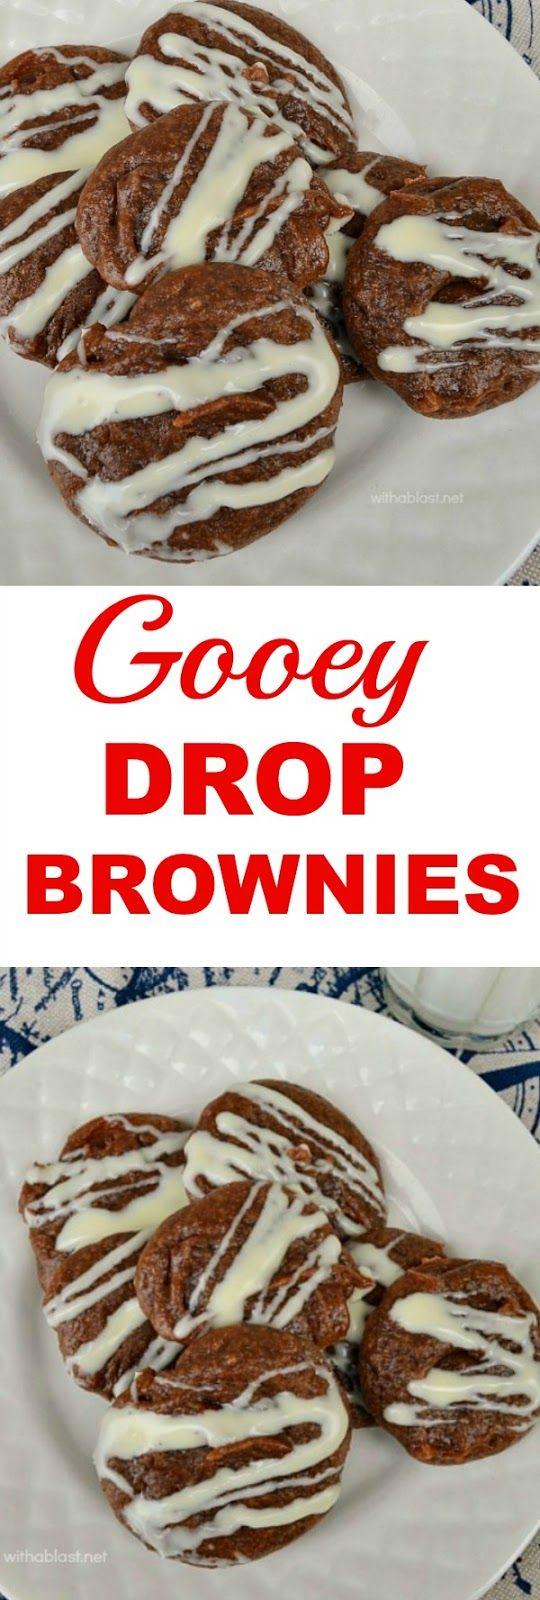 Chewiest Brownie cookies ever with only 4 Ingredients ! Drop & bake